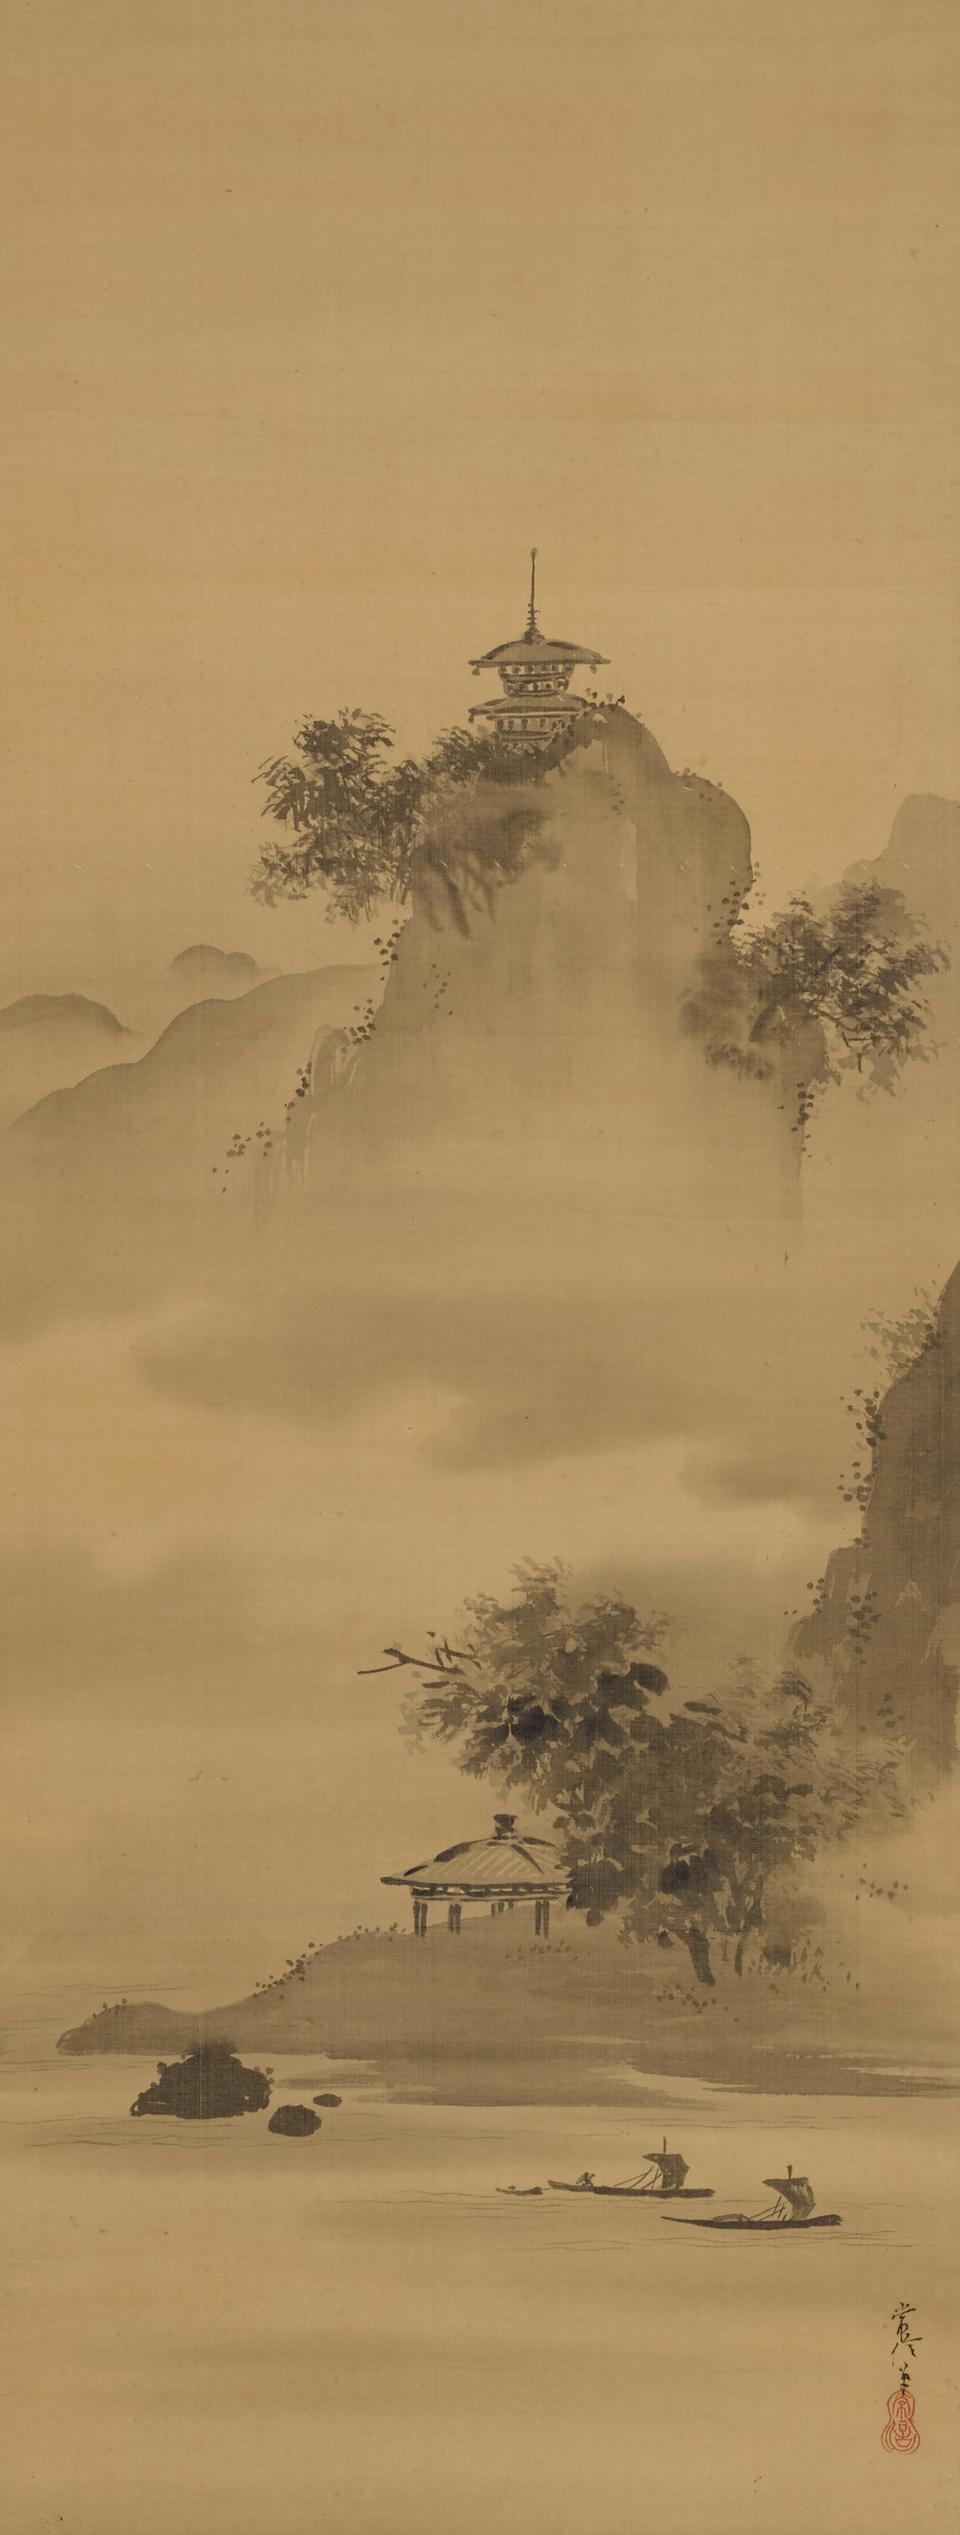 After Kano Tsunenobu (1636-1713) Landscape/Jurojin/Landscape  Edo period (18th/19th century) (3)